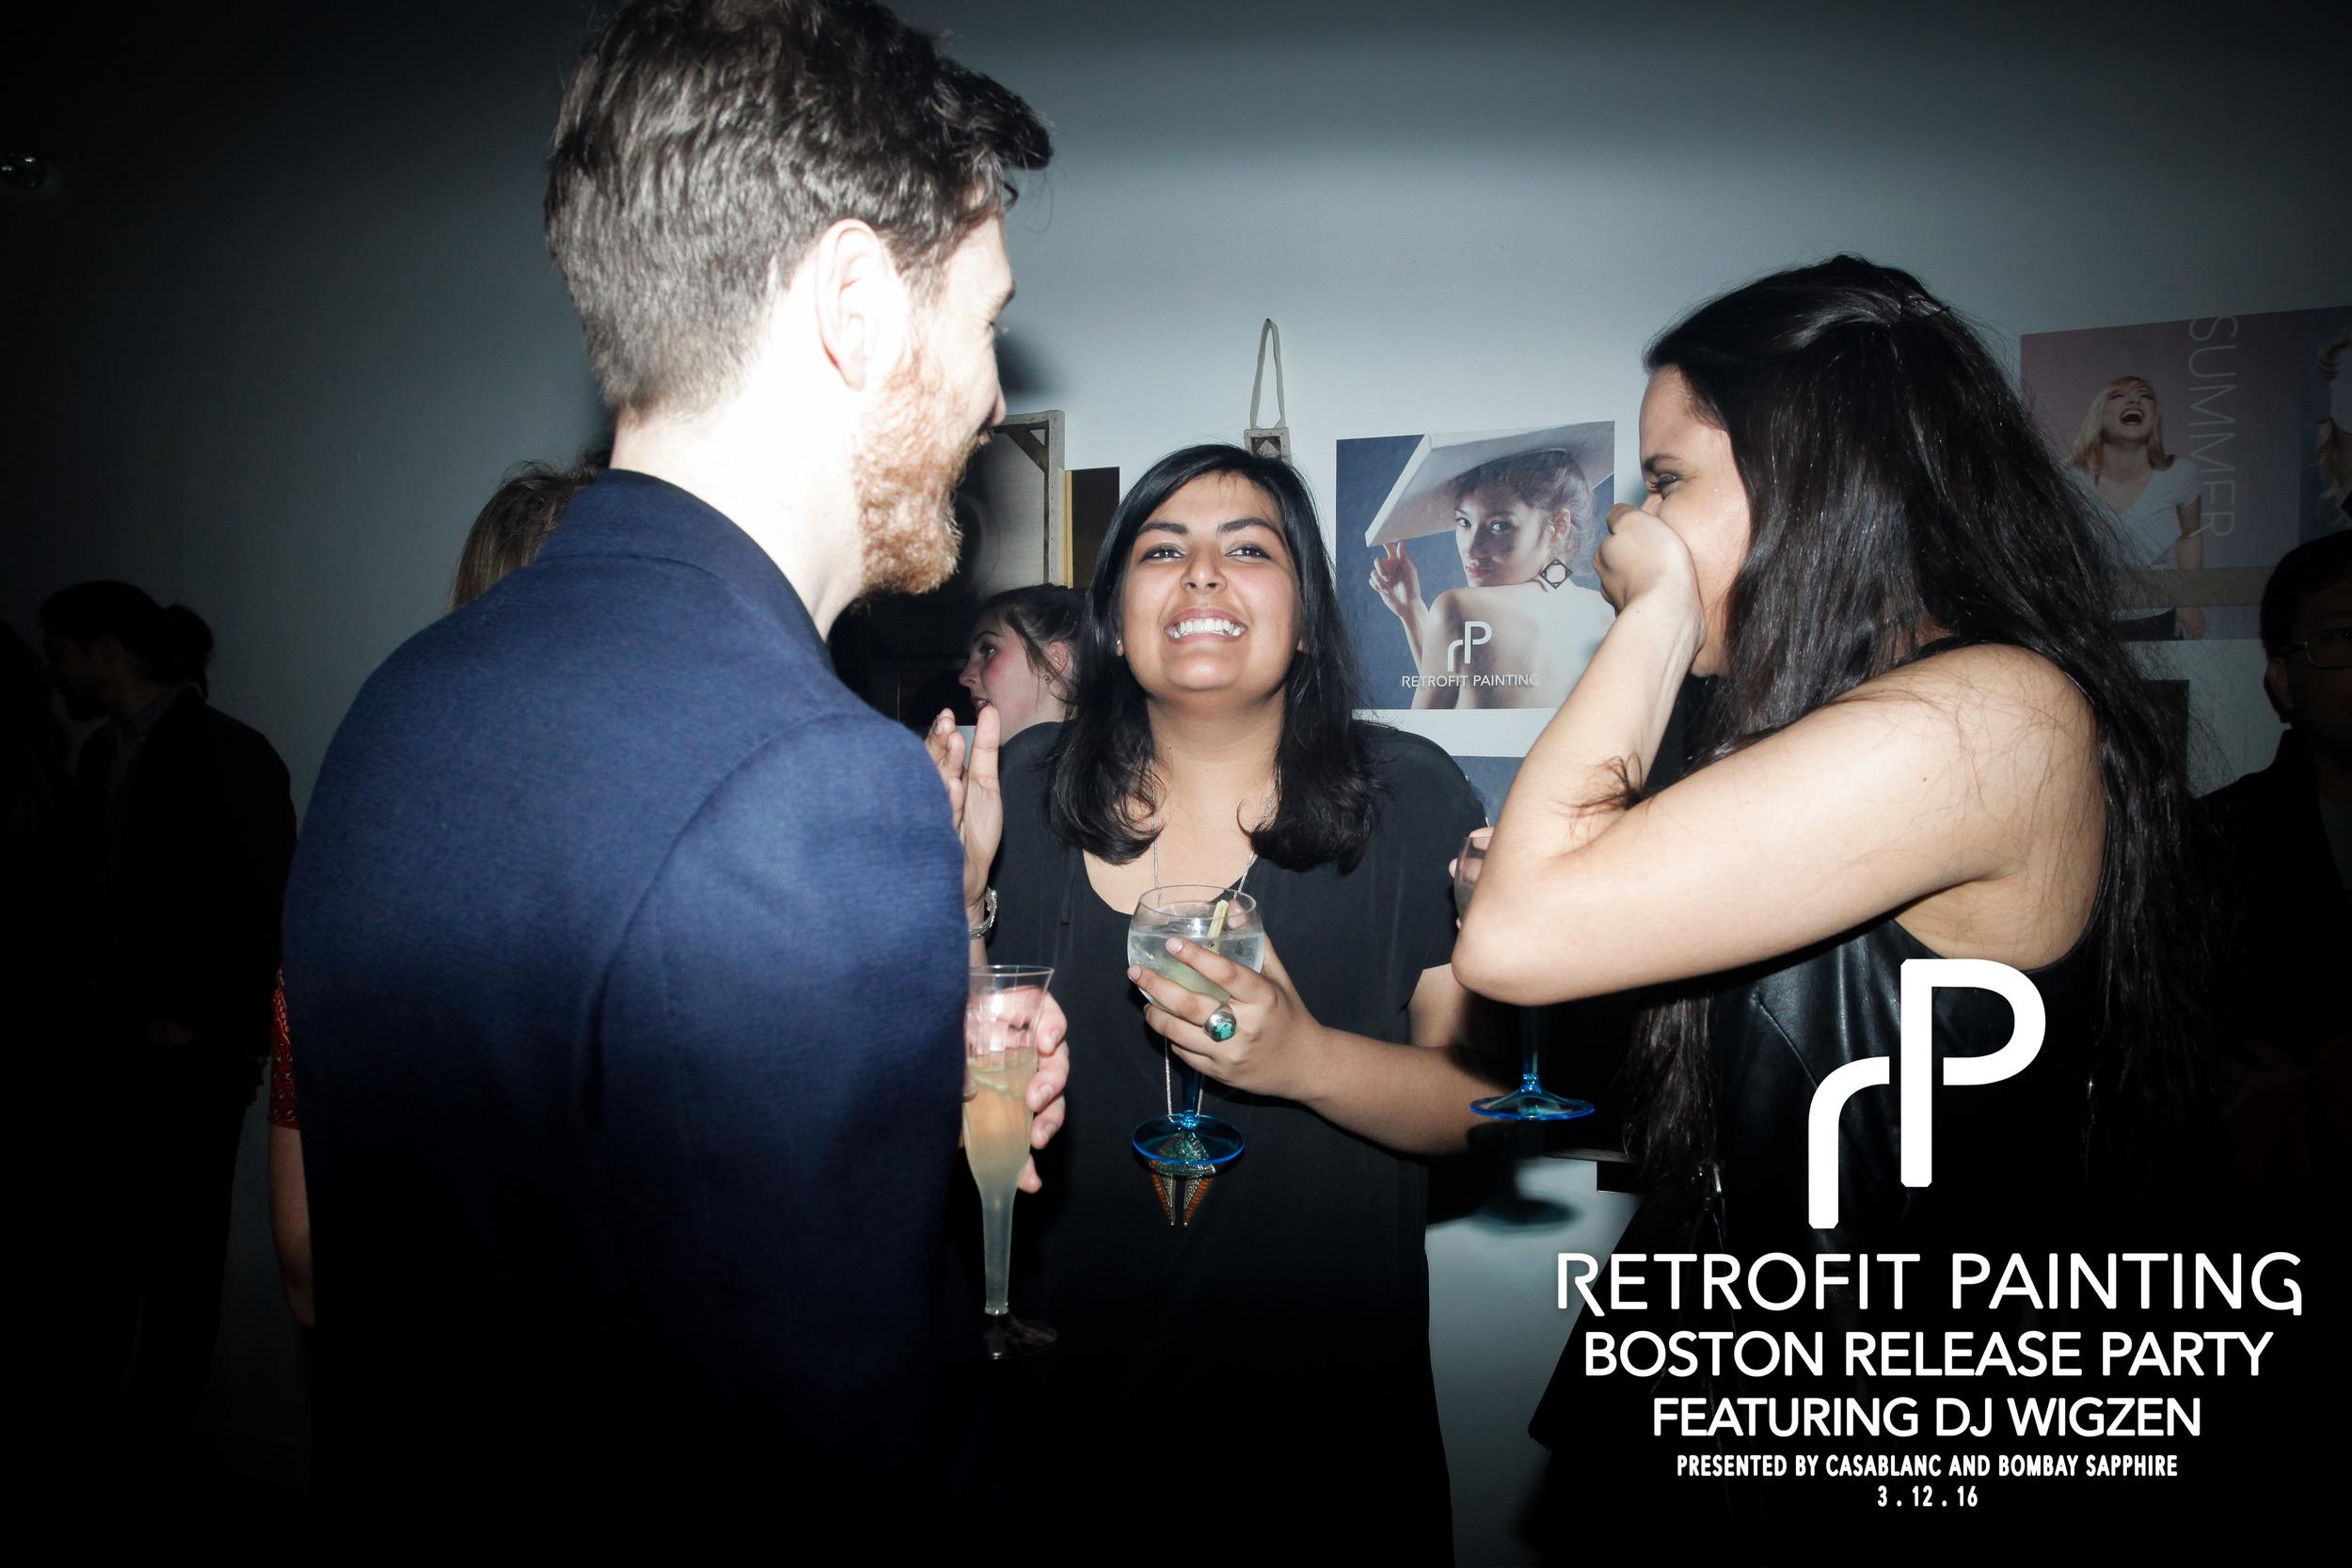 Retrofit Painting Boston Release Party 0107.jpg